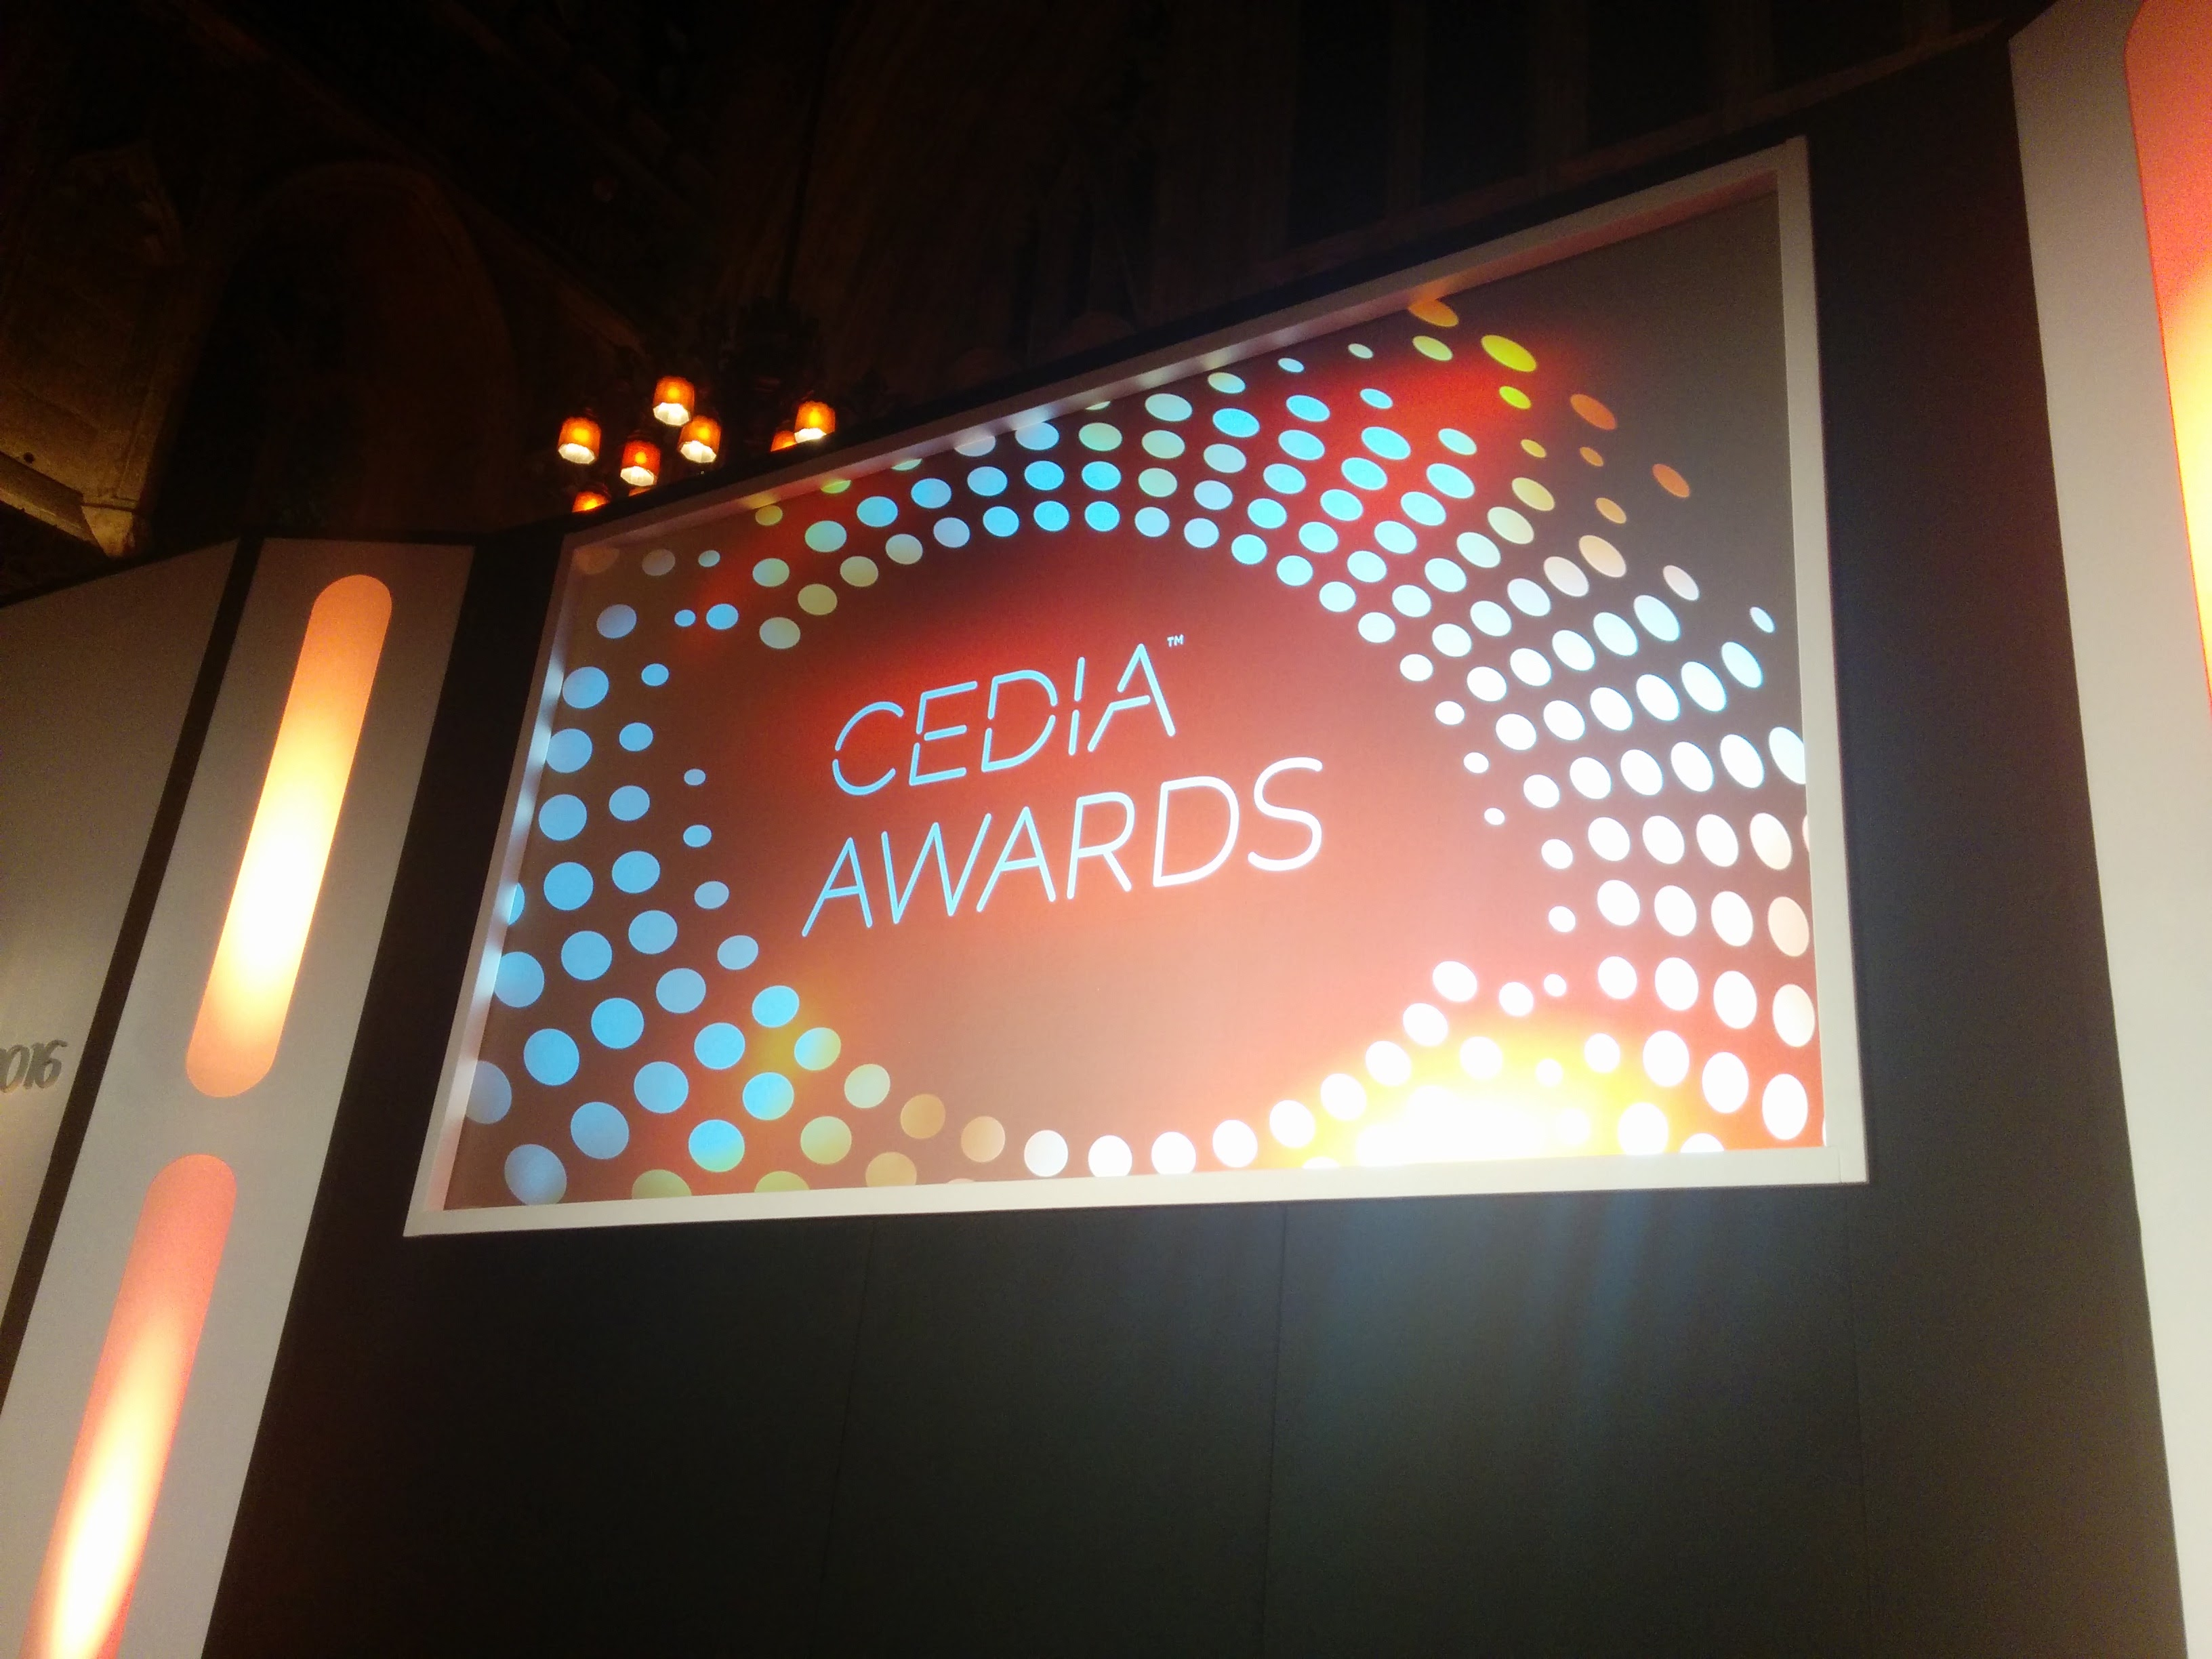 CEDIA Awards 2016 Yearbook